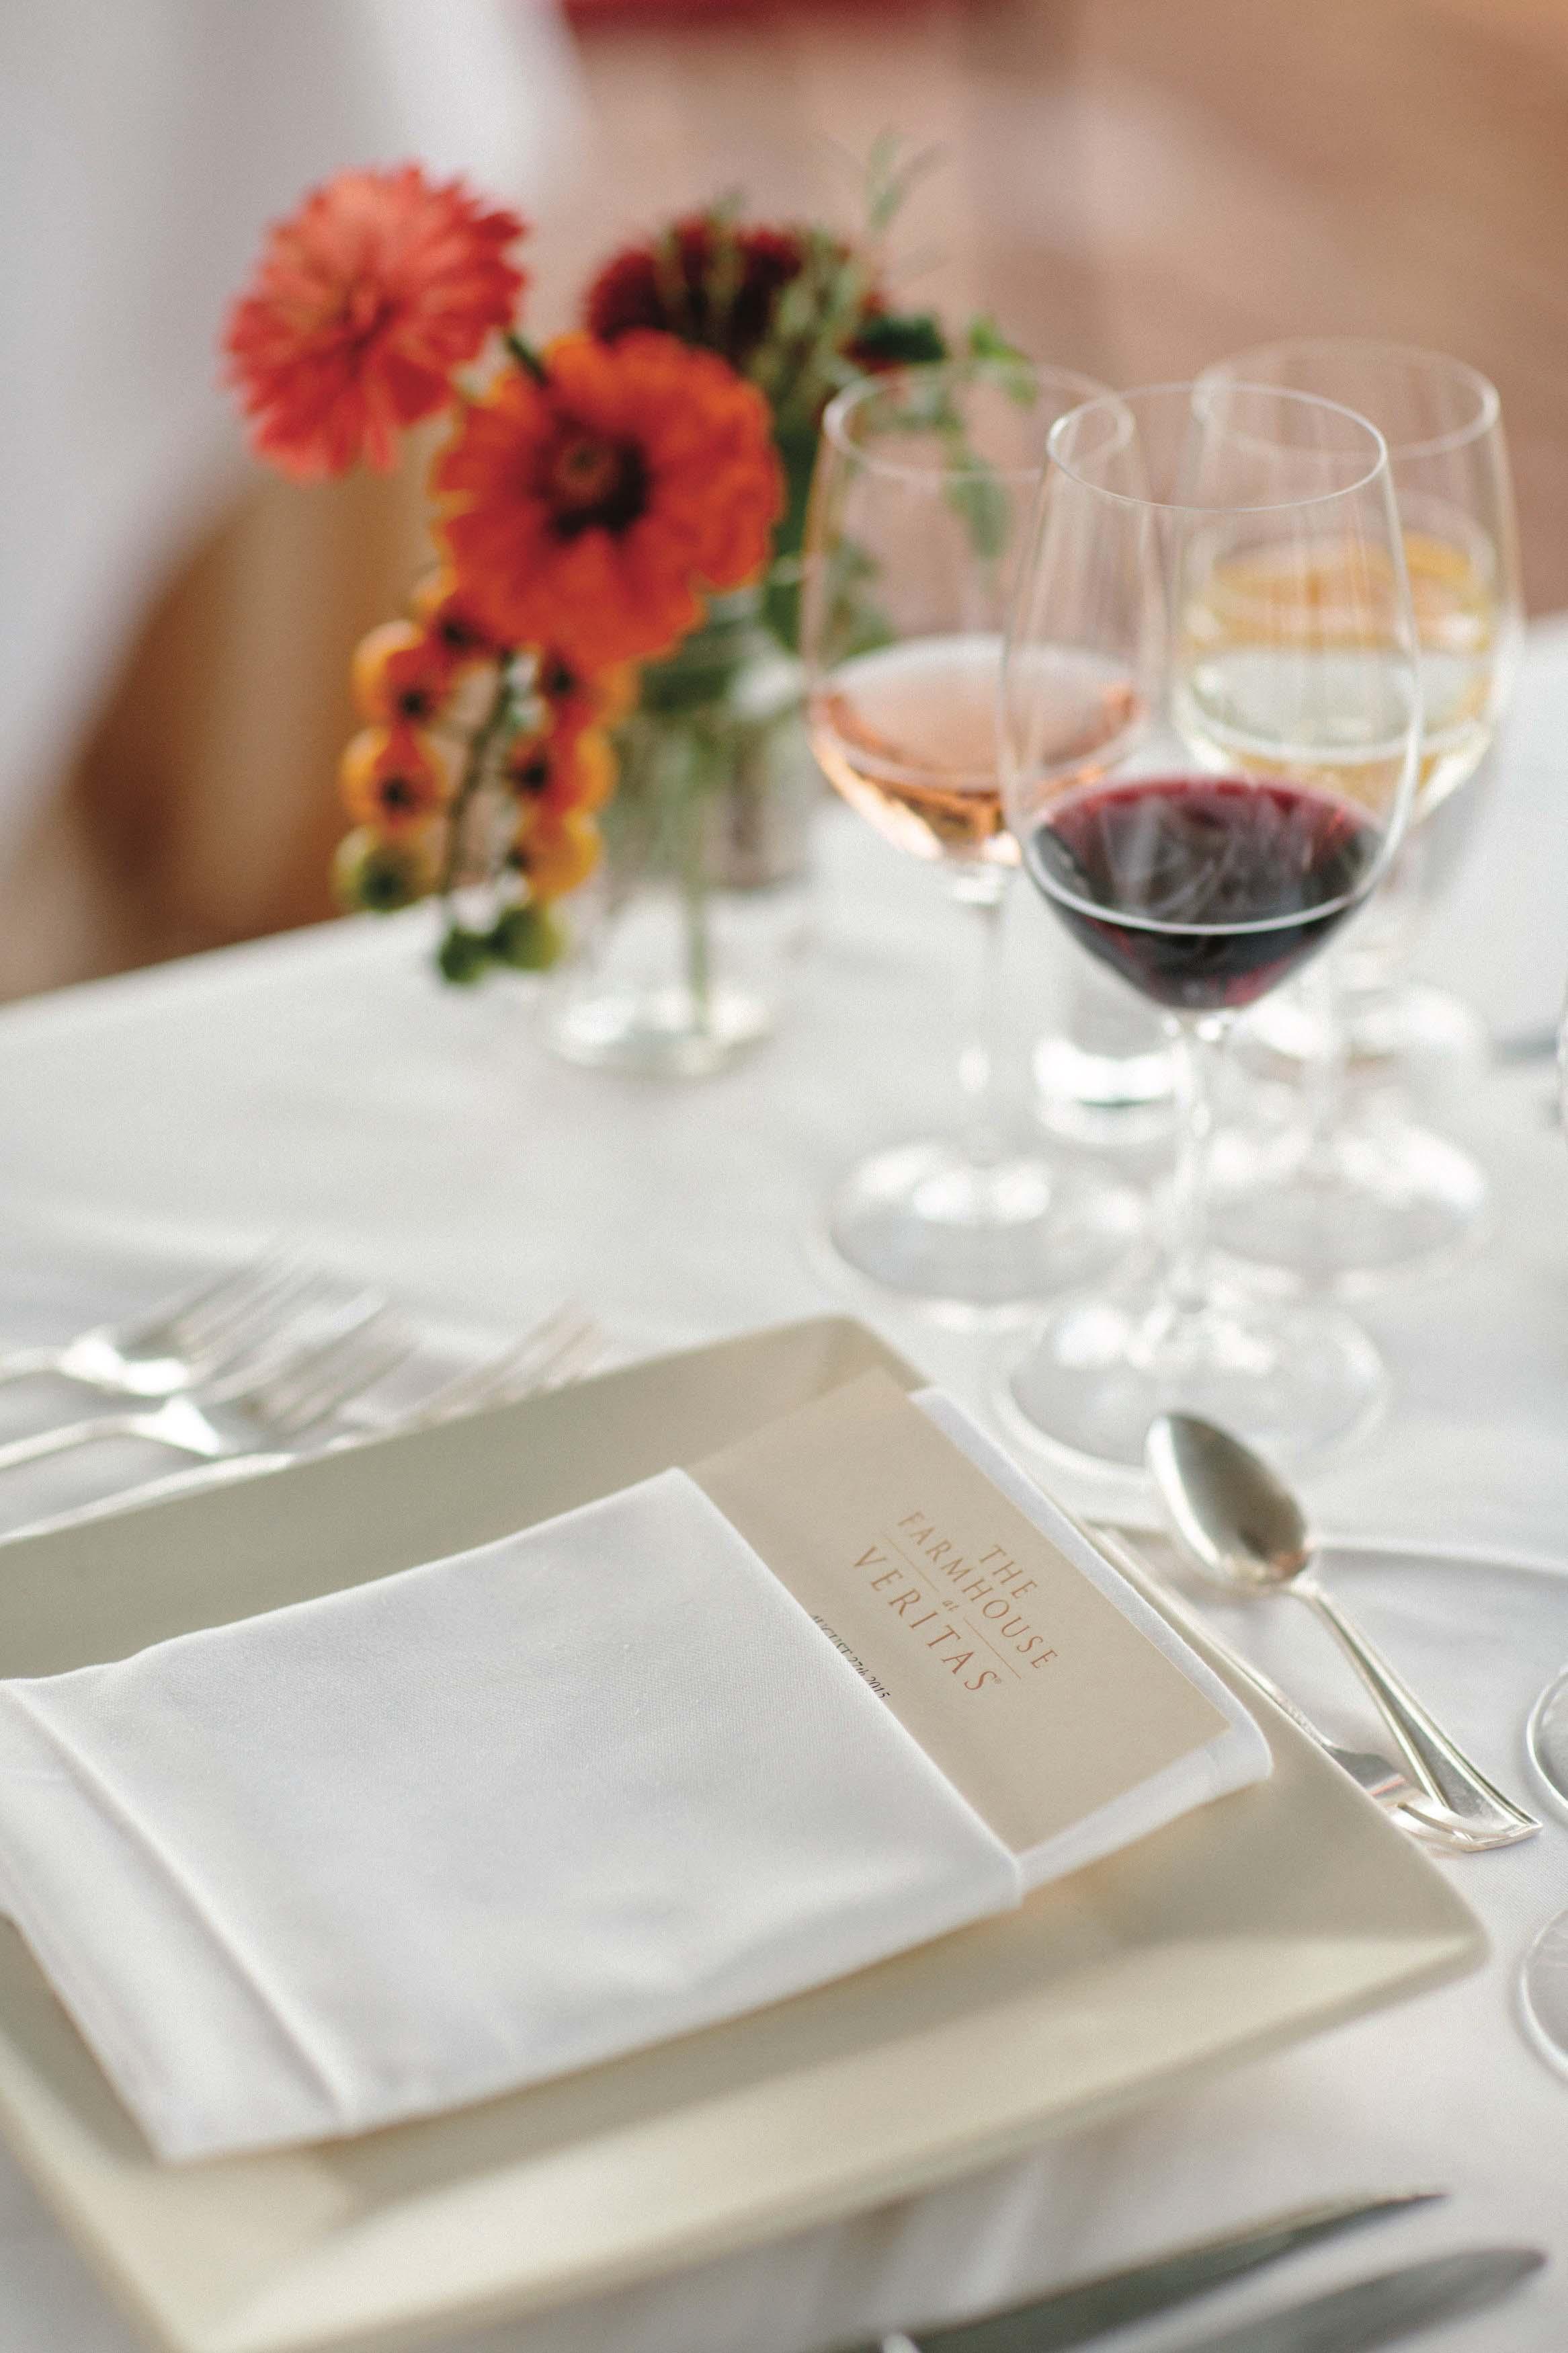 Veritas, Afton, Wineries, Vineyards Central VIrginia